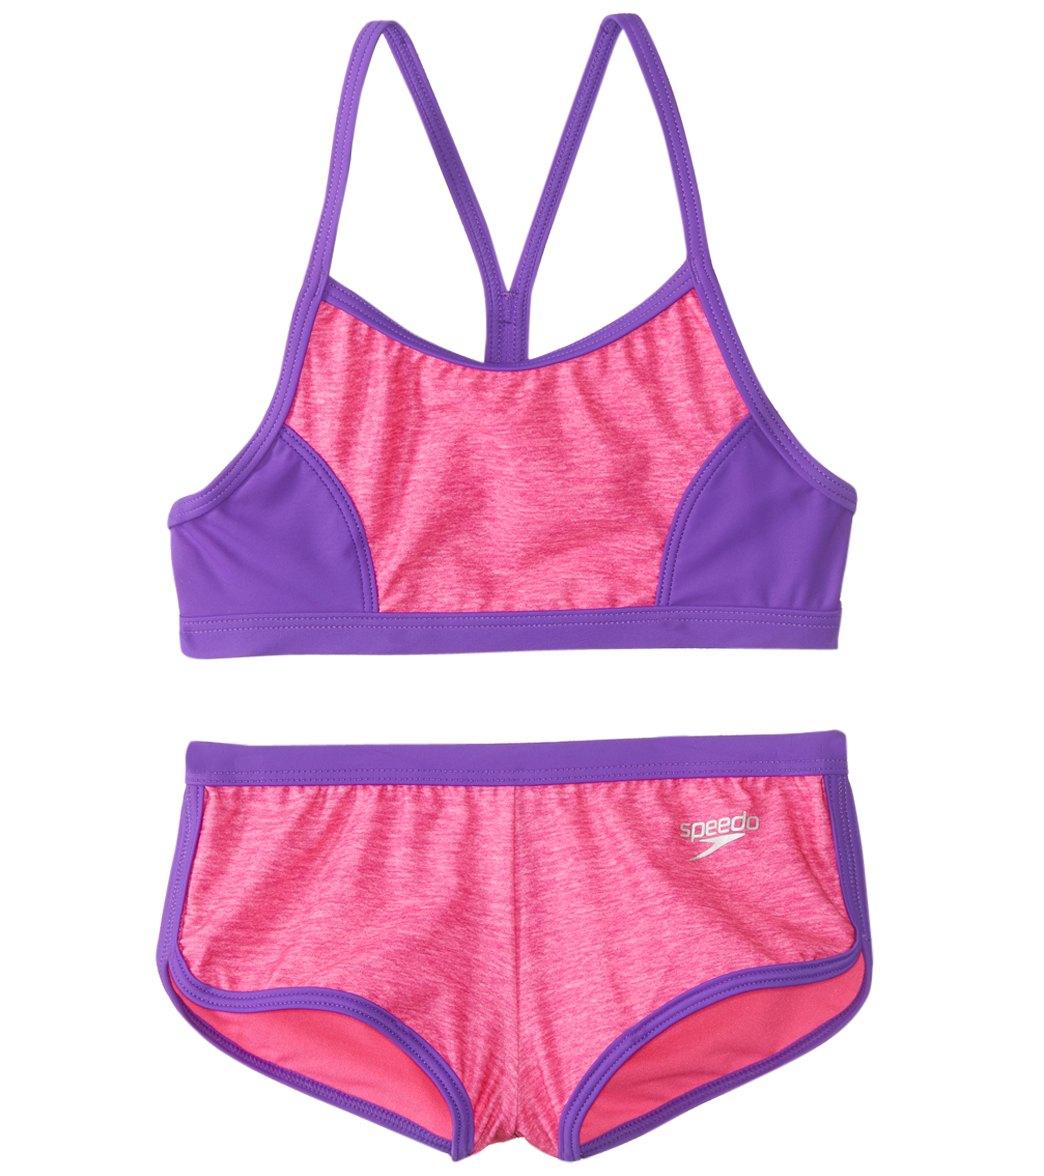 0edc3d4c1da34 Speedo Girls' Heather Splice Boyshort Two Piece Bikini Set (7-16) at  SwimOutlet.com